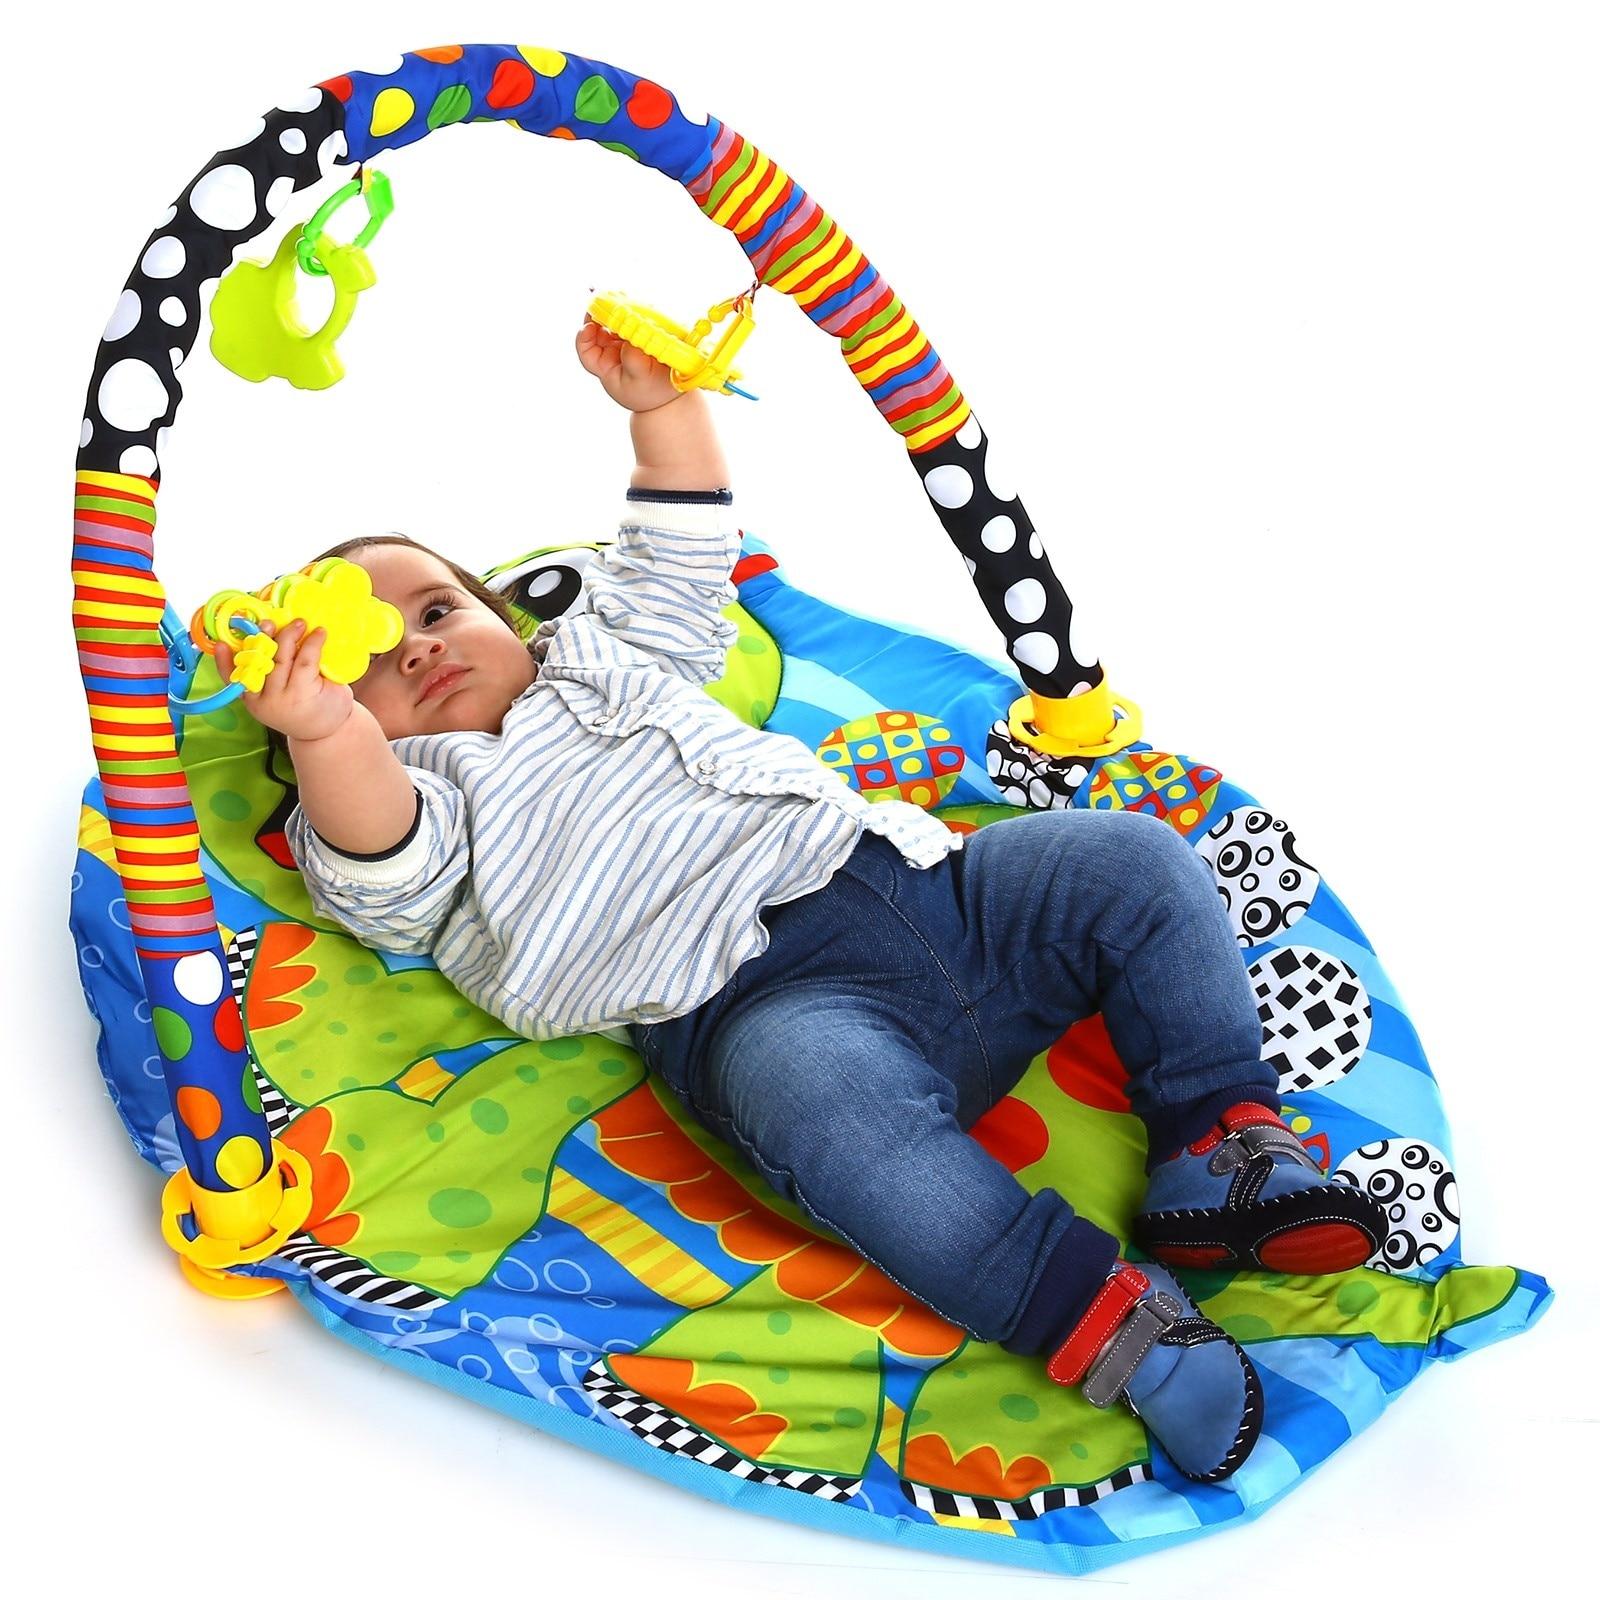 Ebebek Baby Toys Cute Baby Play Mat